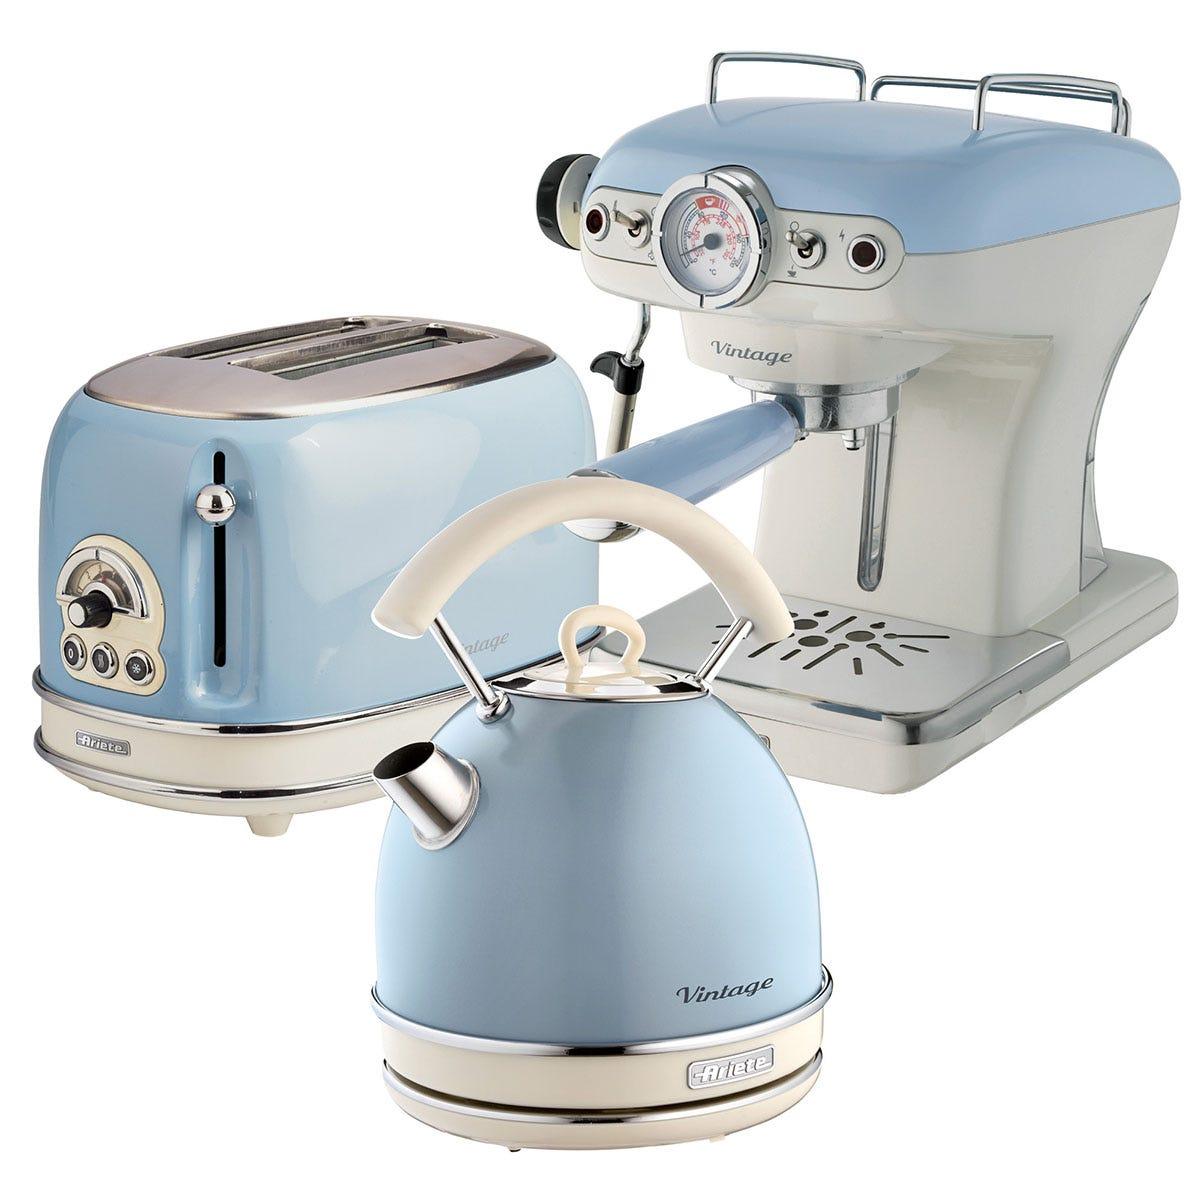 Ariete ARPK18 Vintage 2-Slice Toaster, 1.7L Dome Kettle, and Espresso Coffee Maker - Blue